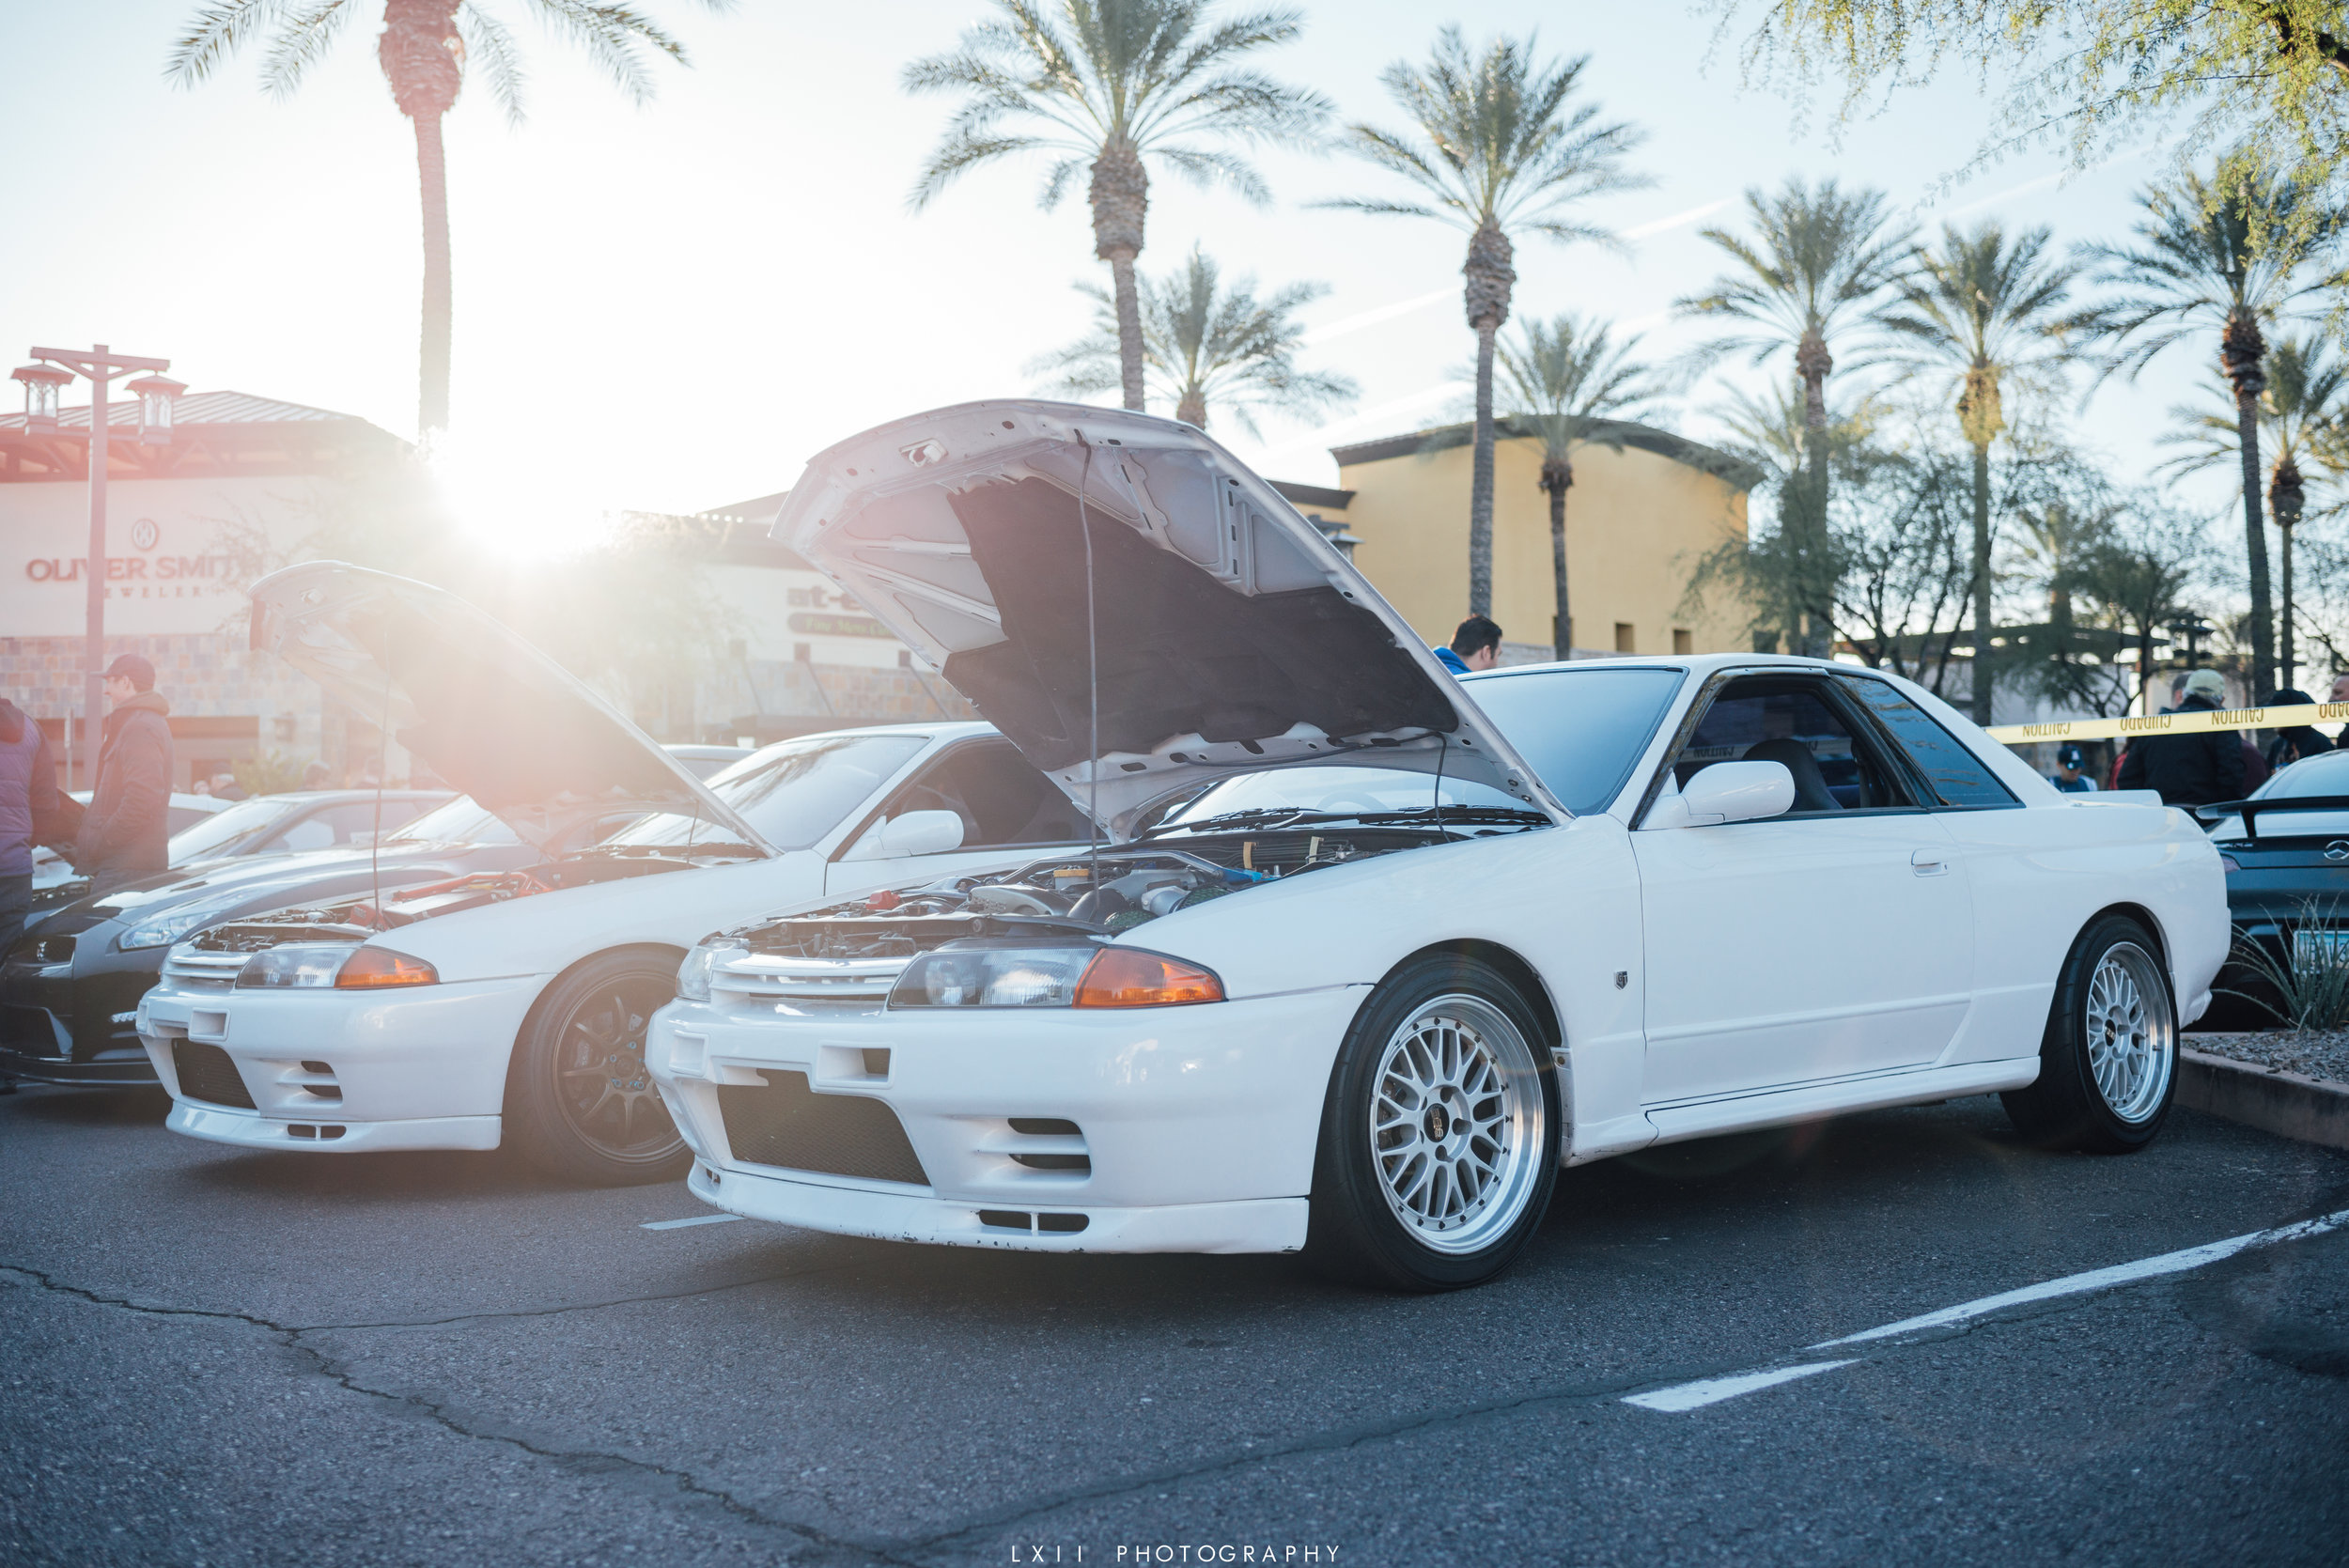 Scuderia Southwest Cars & Coffee Scottsdale - February